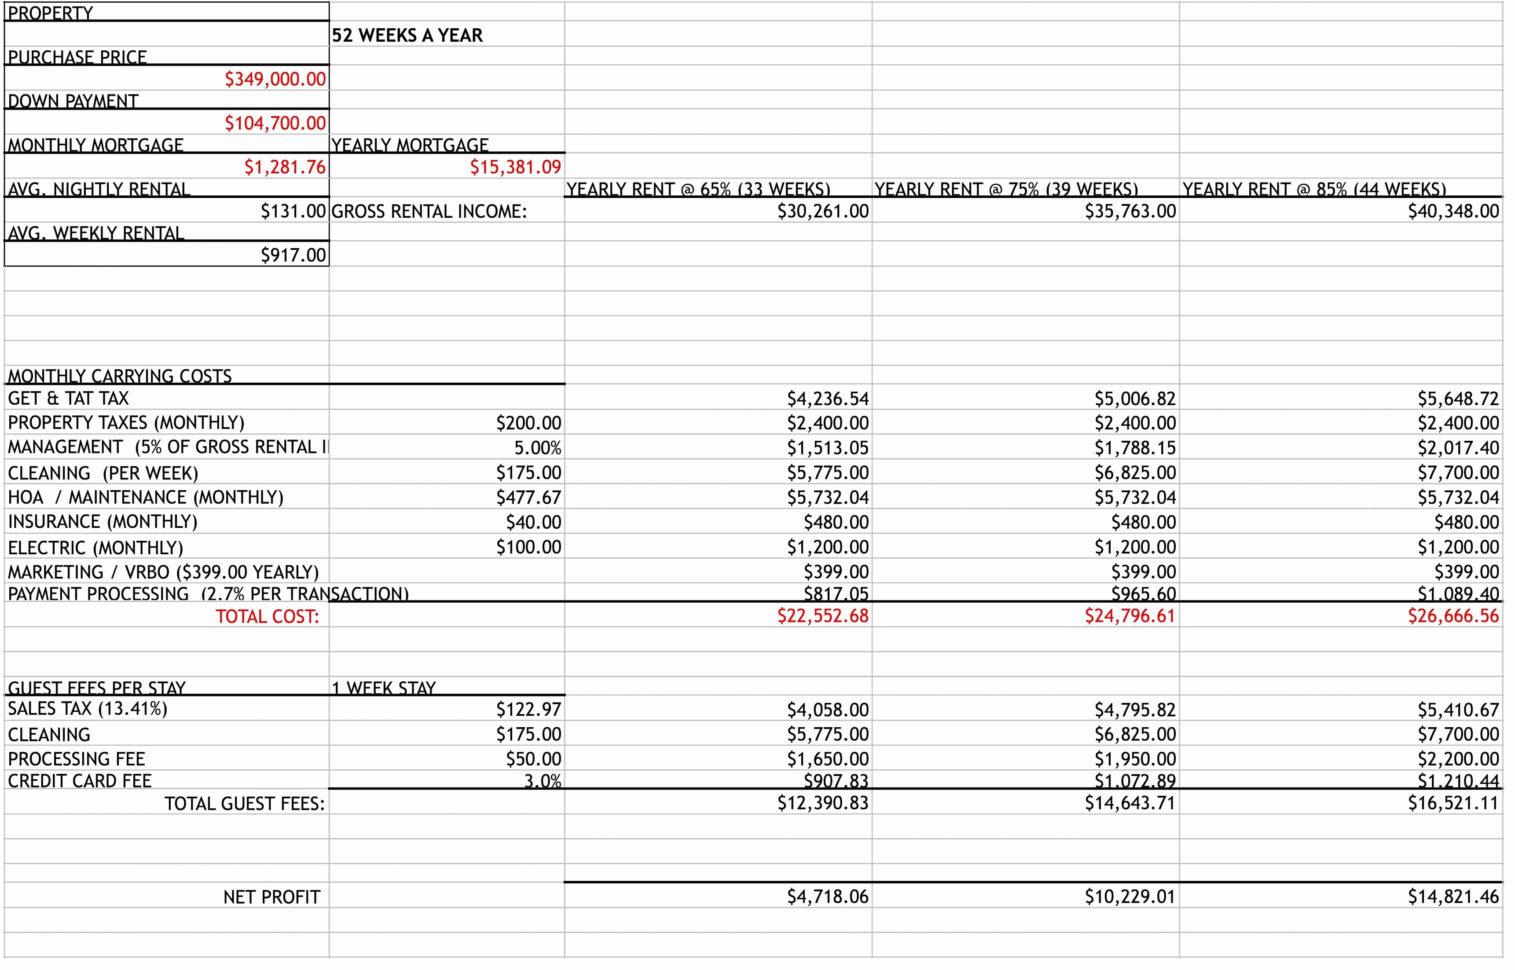 Blank Cma Spreadsheet Inside Free Cma Spreadsheet Blank Best Of Real Estate  Pywrapper